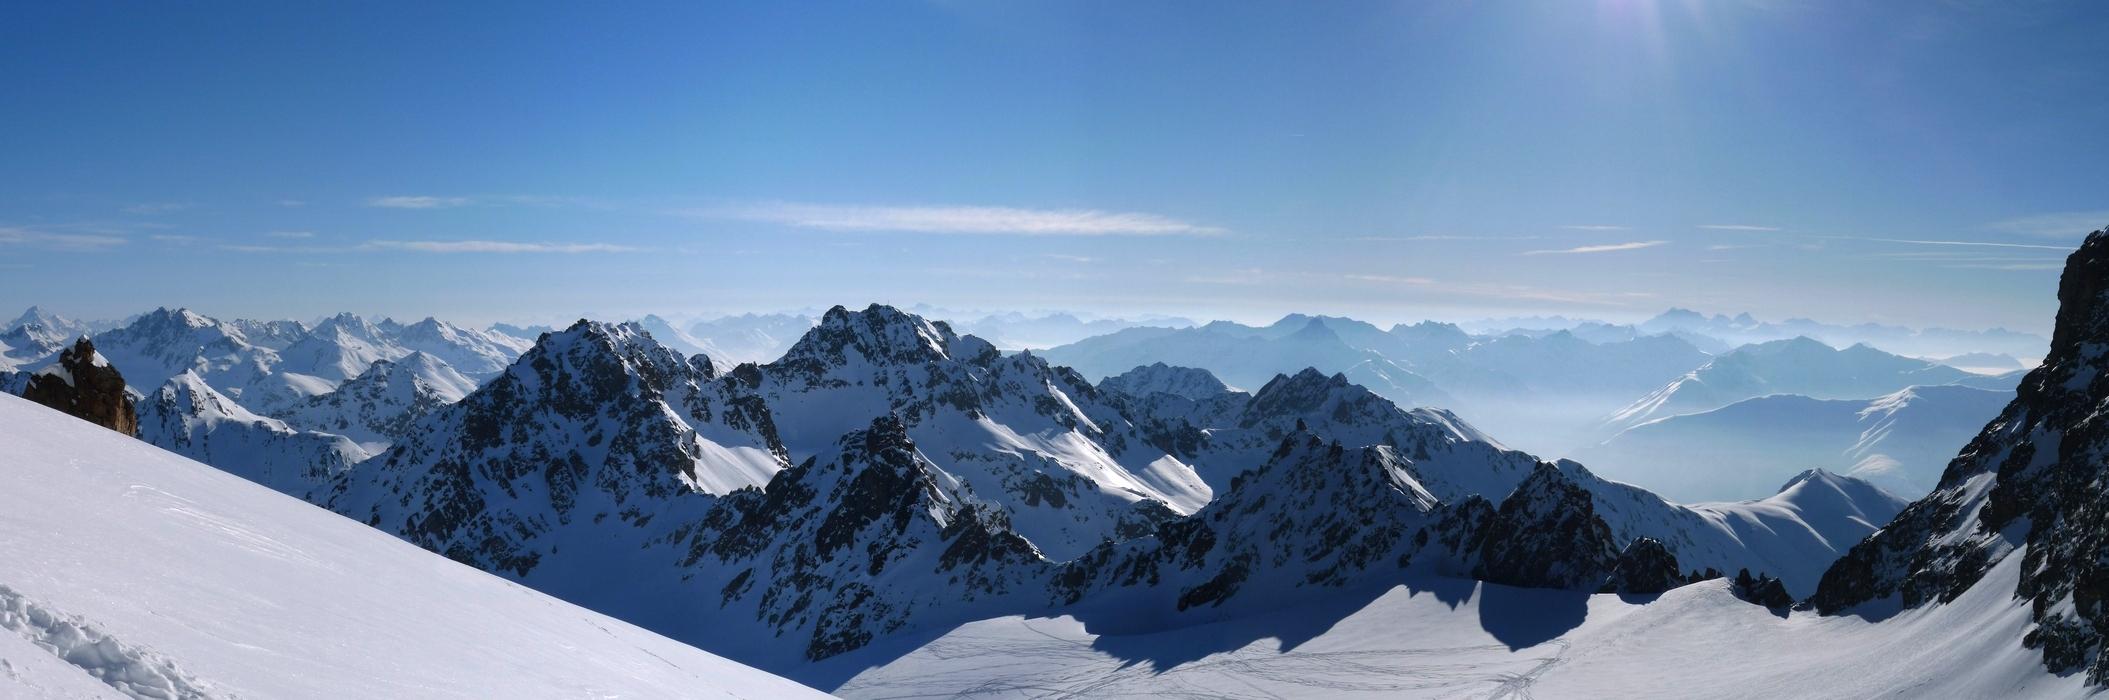 Piz Kesch - Chamanna Kesch Albula Alpen Švýcarsko panorama 27